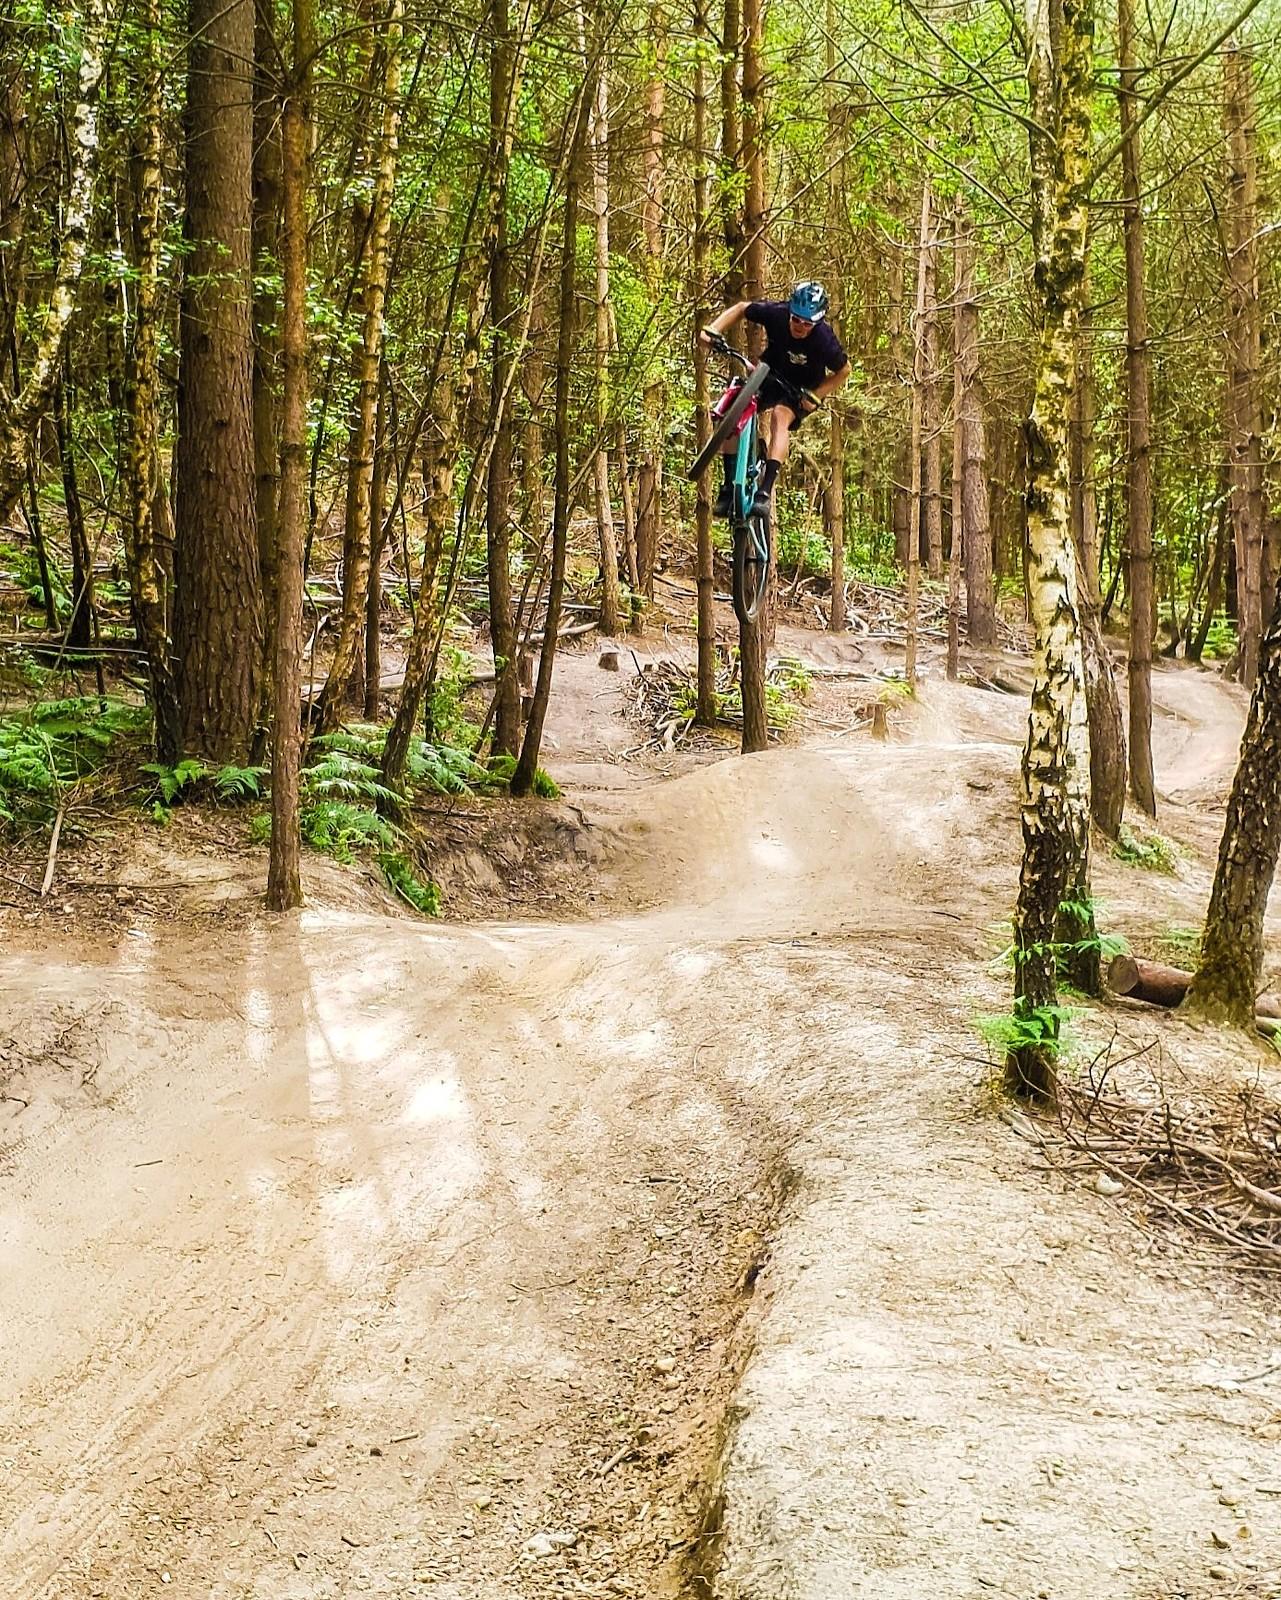 Ambroise Hébert send the wilkins leap at swinley forest - Ambroise_Hebert-Racing - Mountain Biking Pictures - Vital MTB